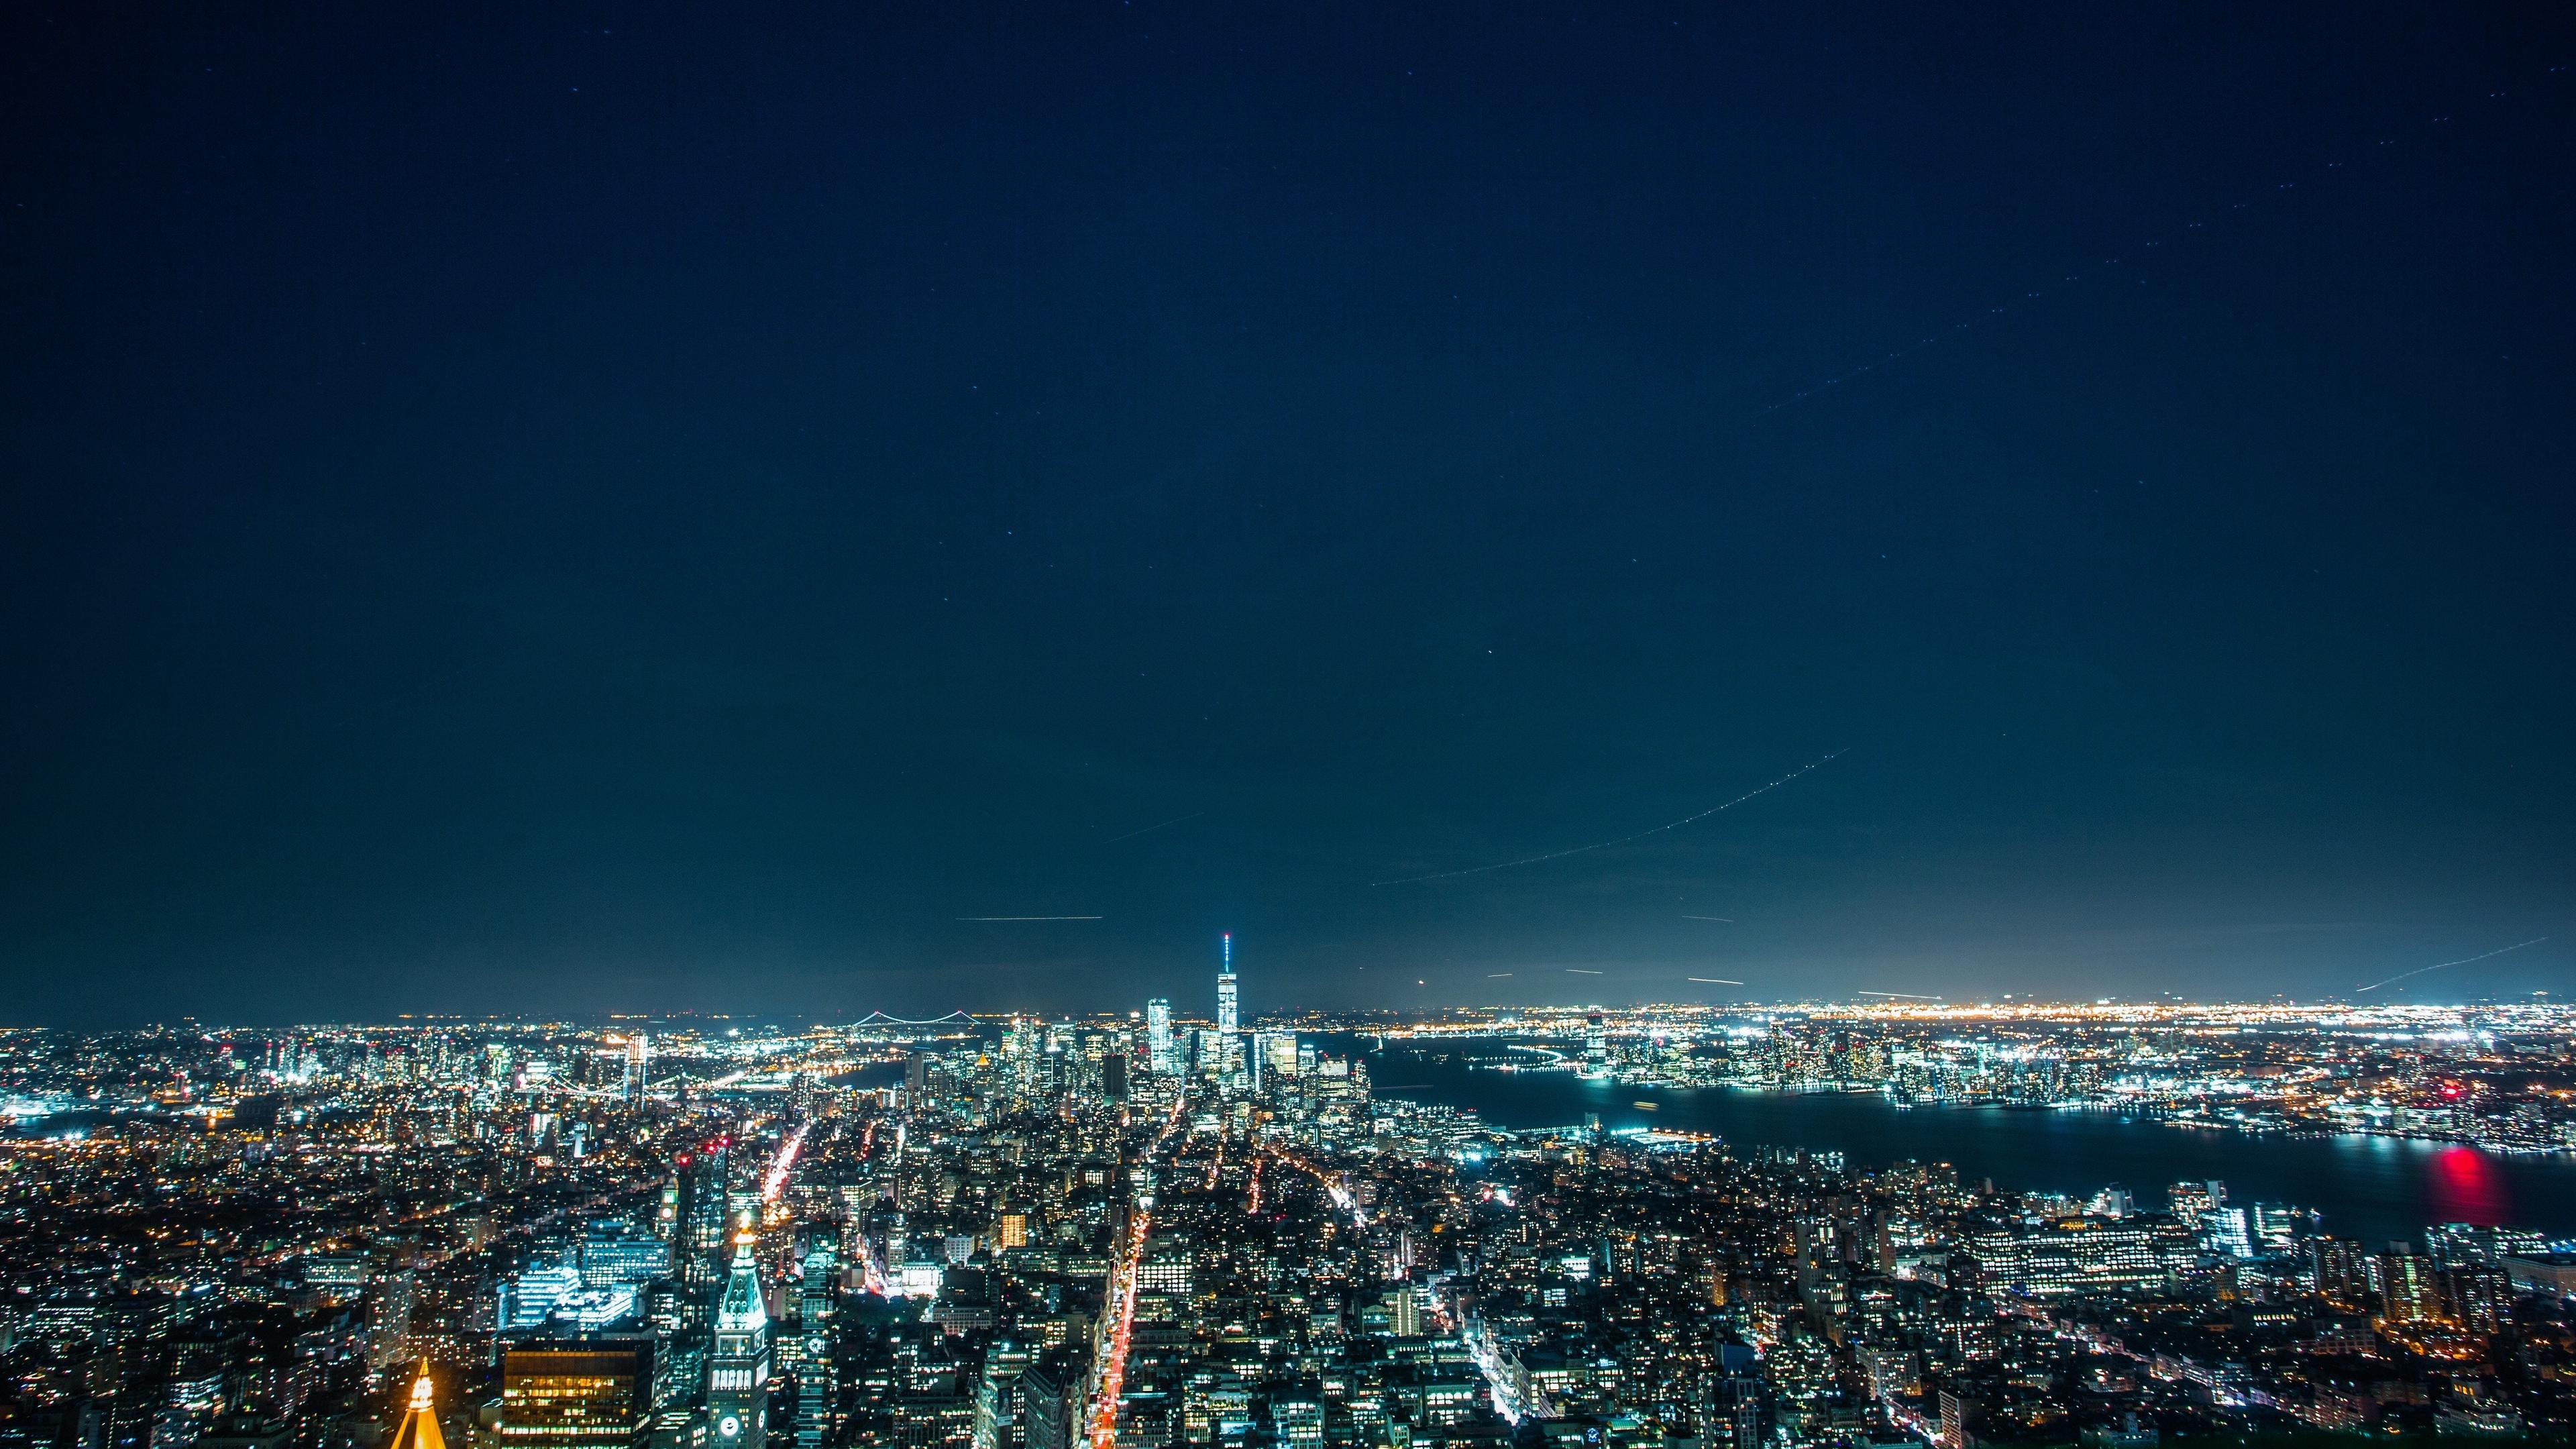 night city night city lights 4k 1538065546 - night city, night, city lights 4k - night city, Night, city lights